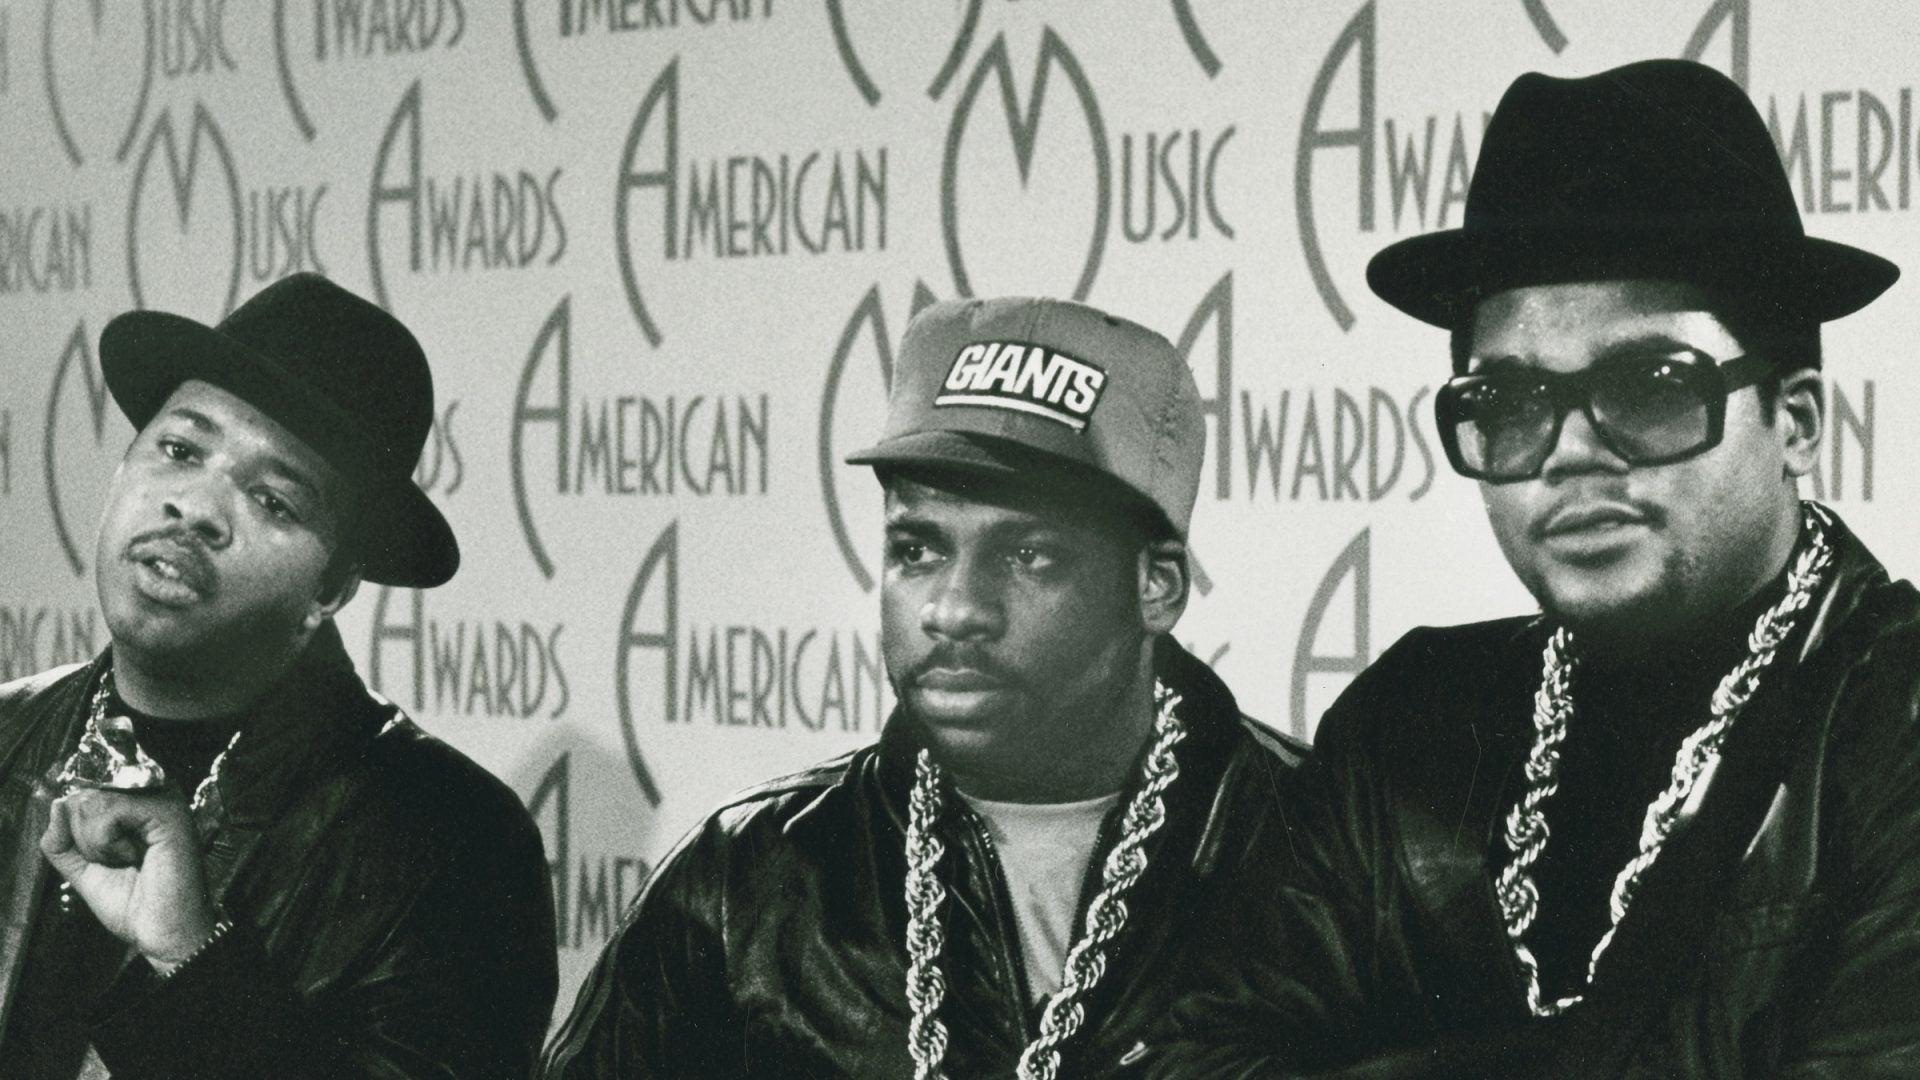 Karl Jordan Jr. And Ronald Washington Indicted For The Murder Of Jam Master Jay